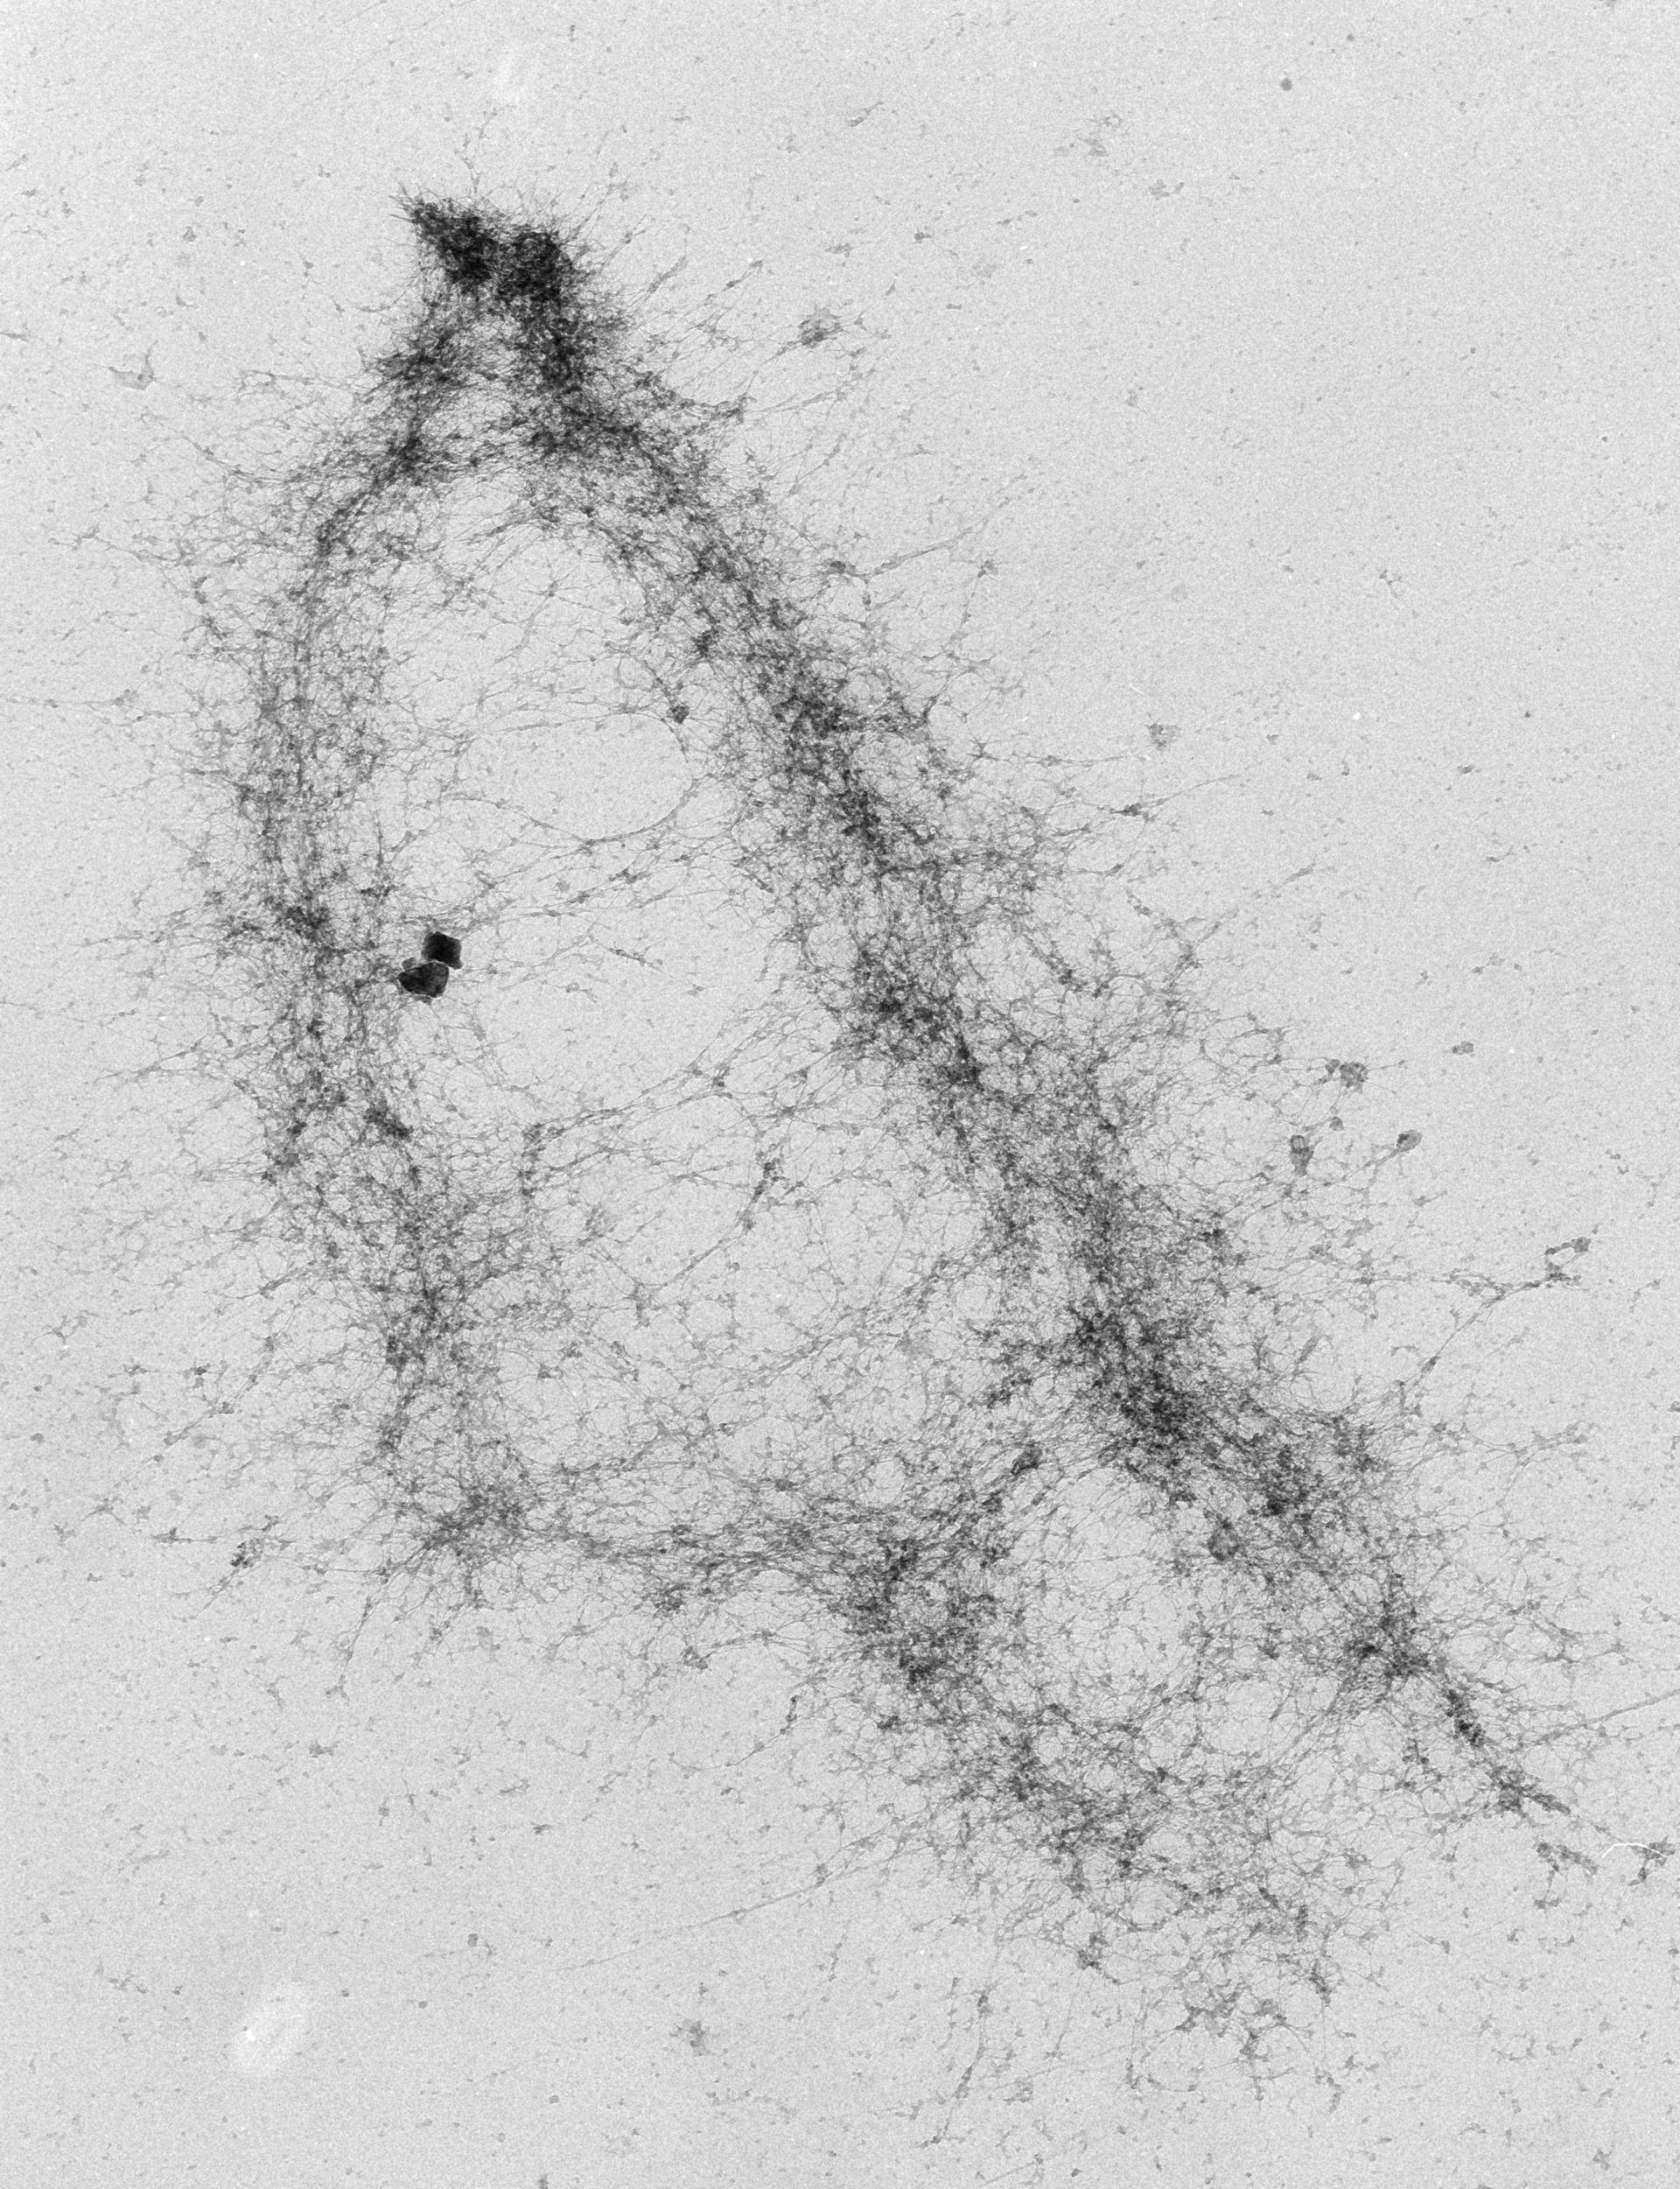 Mus musculus (Nuclear chromosome) - CIL:40687